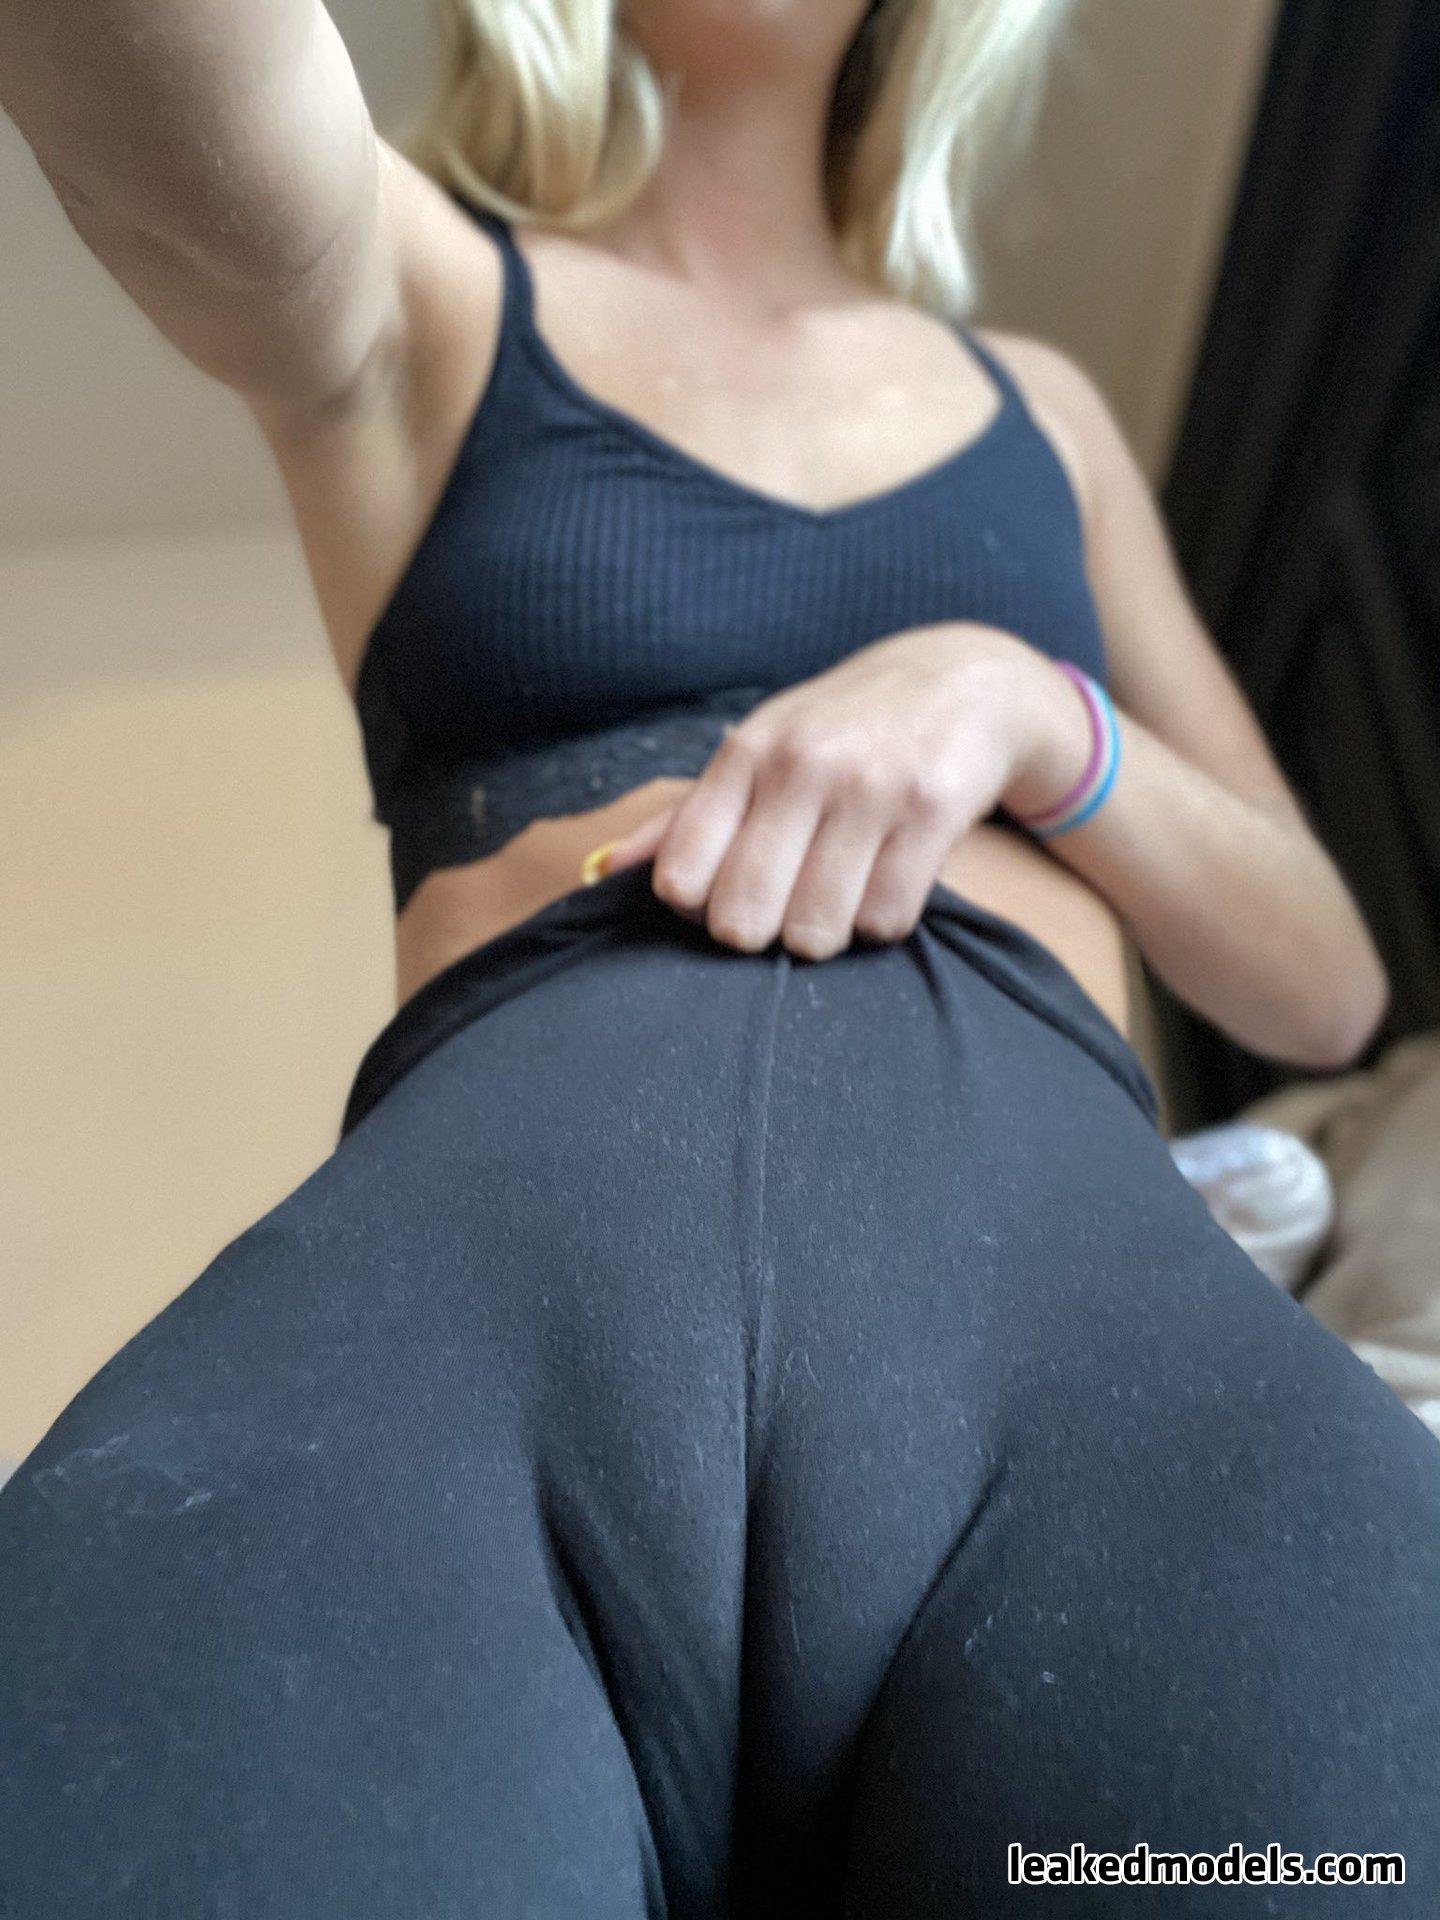 Slimthickbri OnlyFans Nude Leaks (27 Photos)